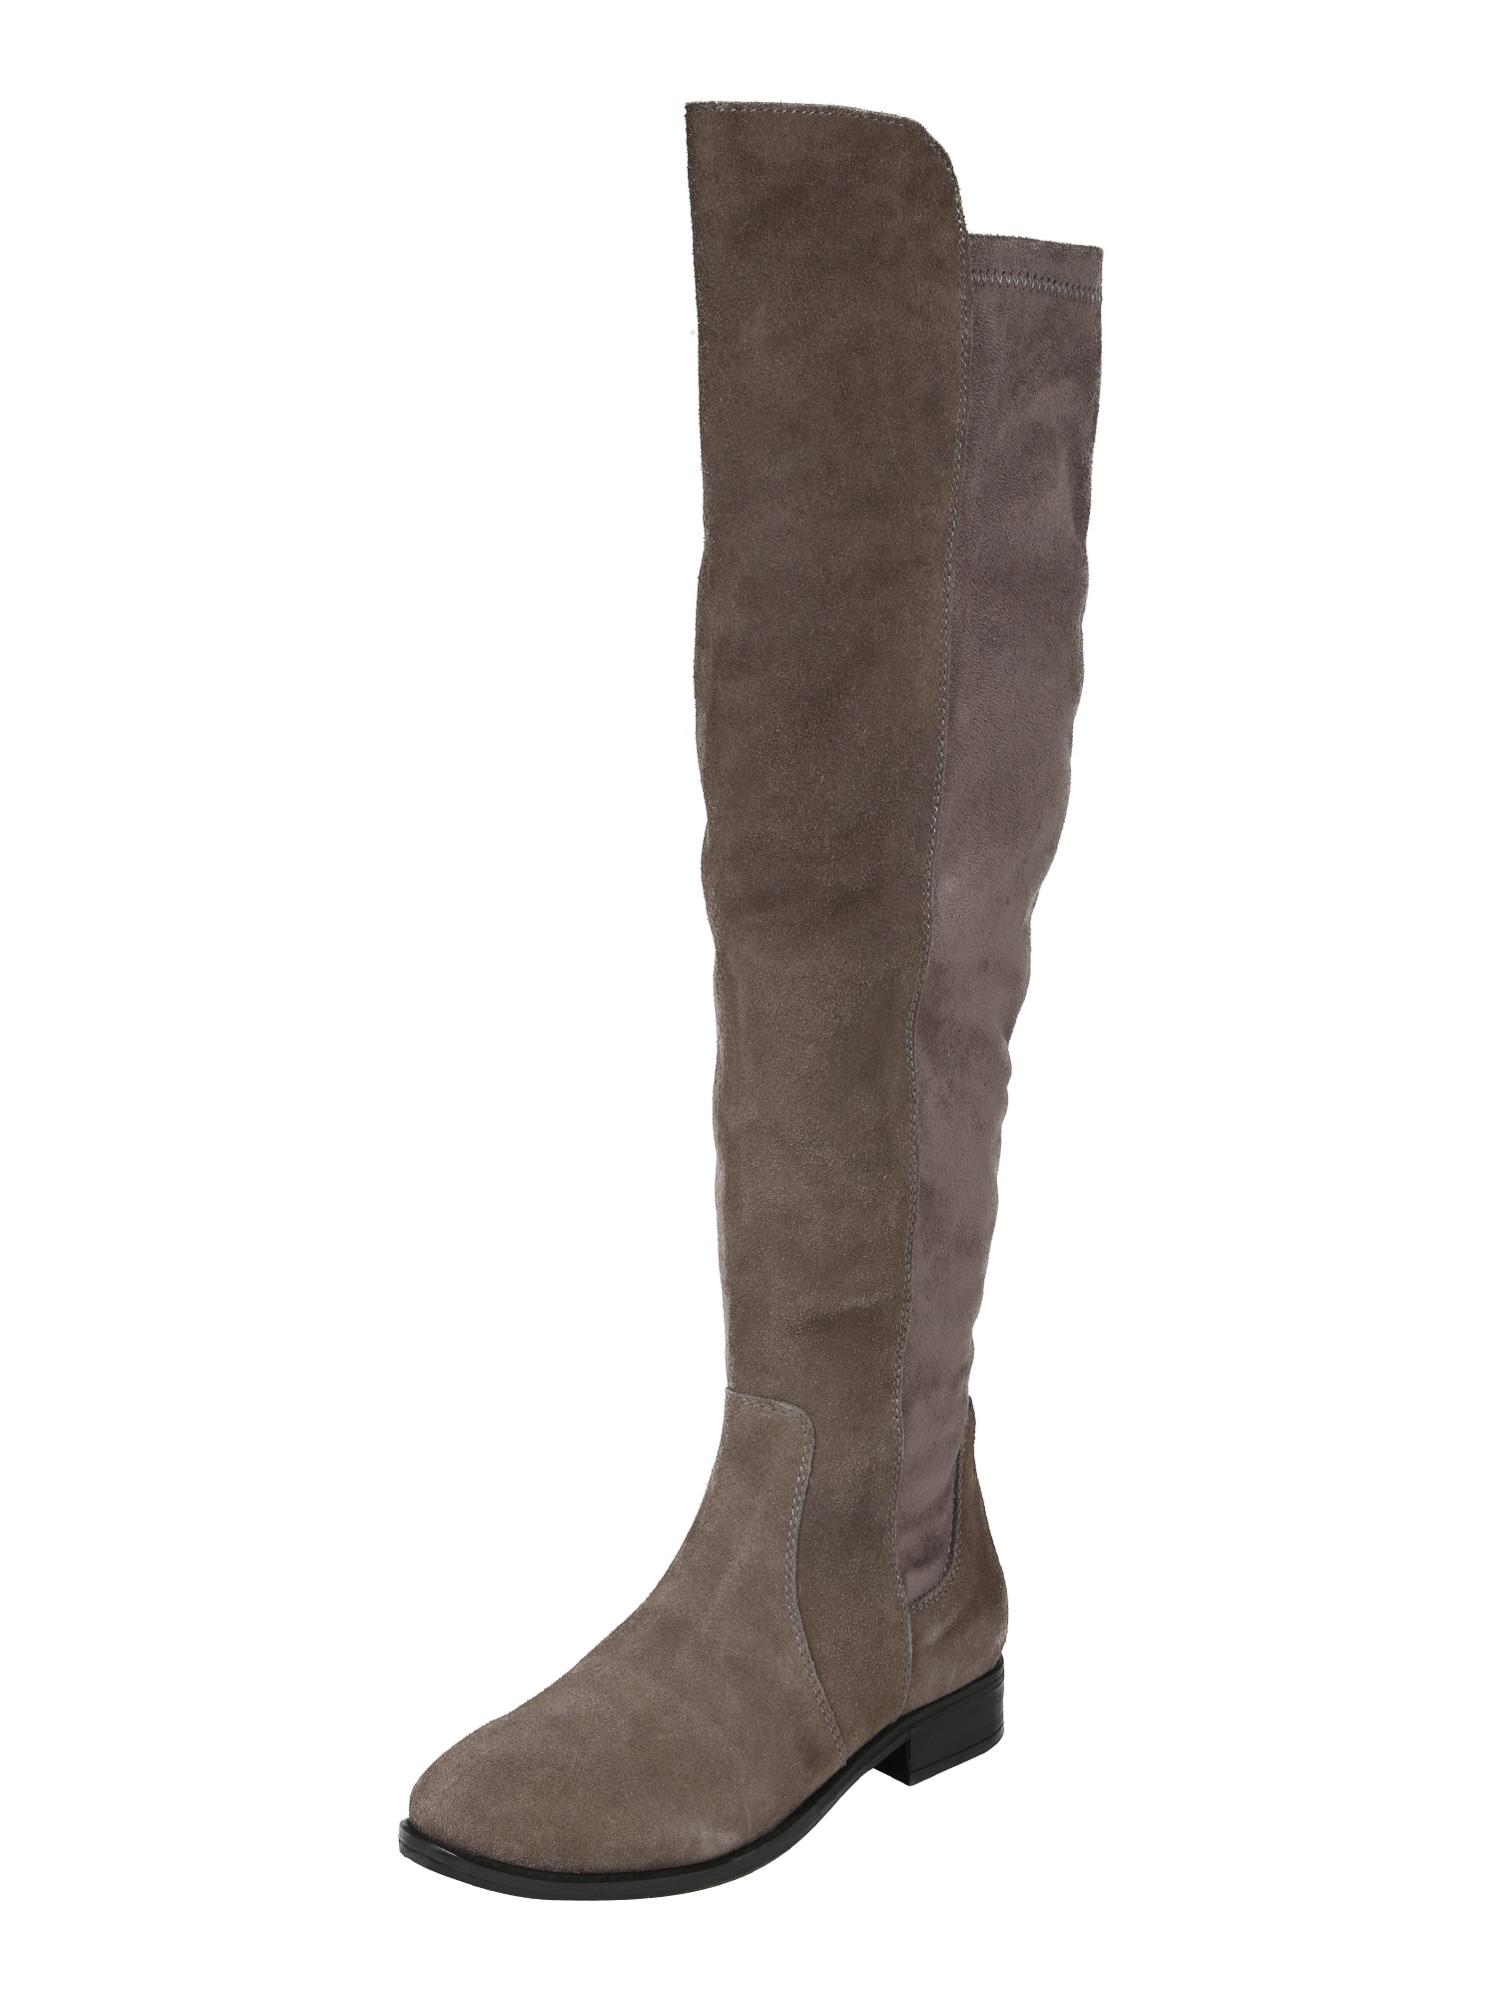 Stiefel 'Carolina' | Schuhe > Stiefel > Sonstige Stiefel | Dunkelgrau | ABOUT YOU